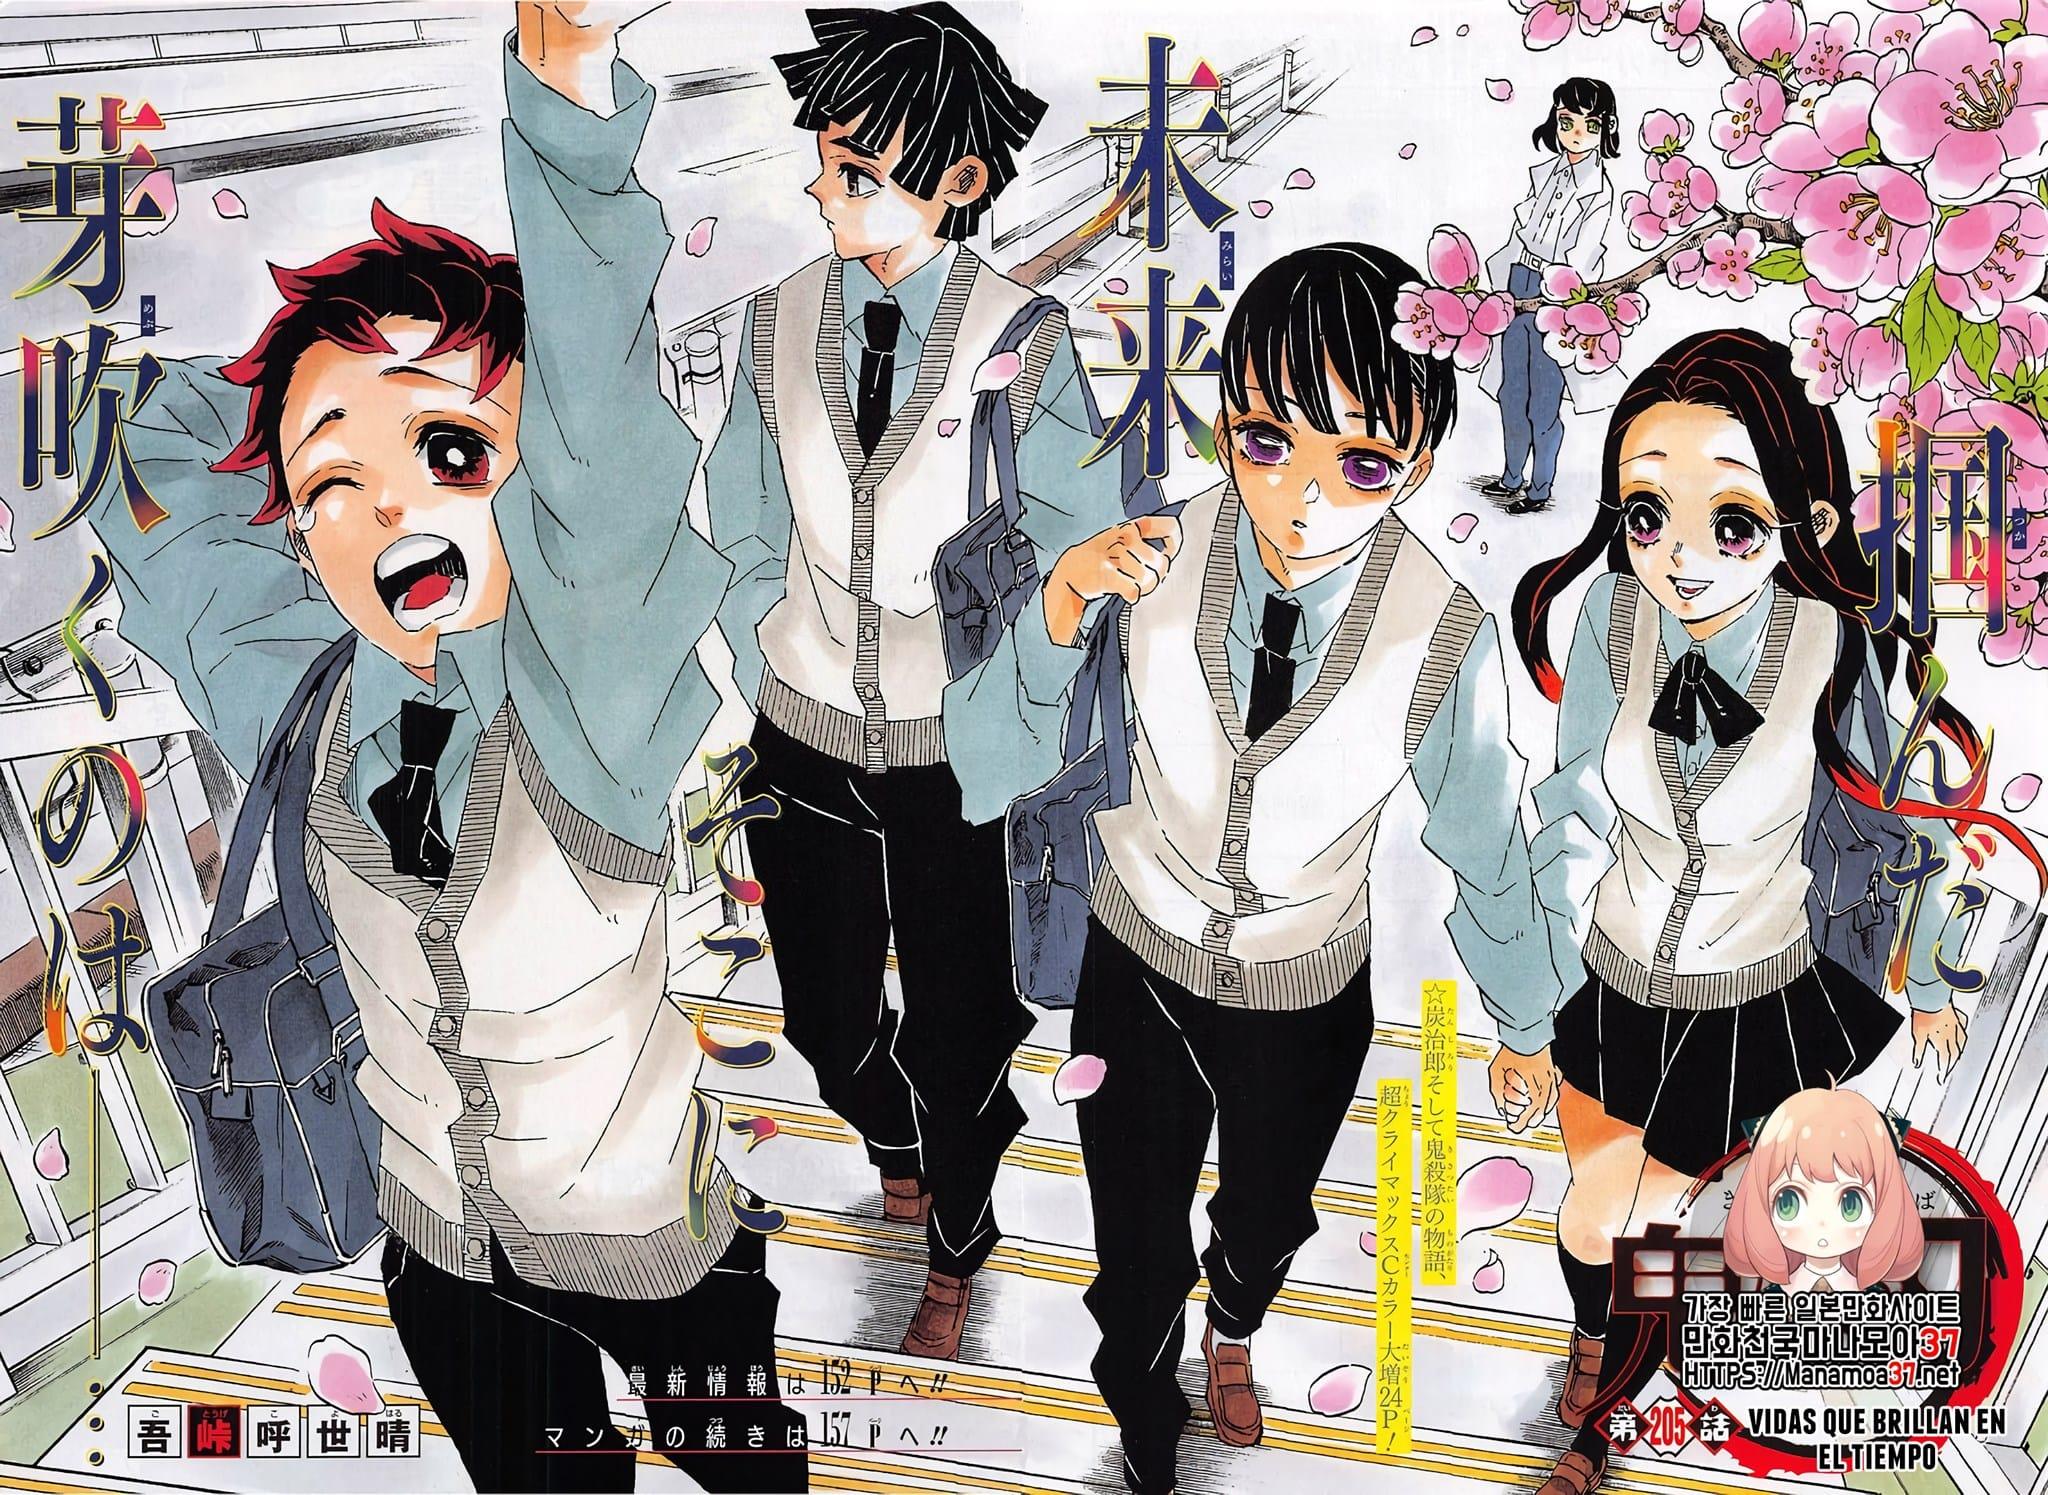 Featured image for Demon Slayer: Kimetsu no Yaiba manga review: Is it good?